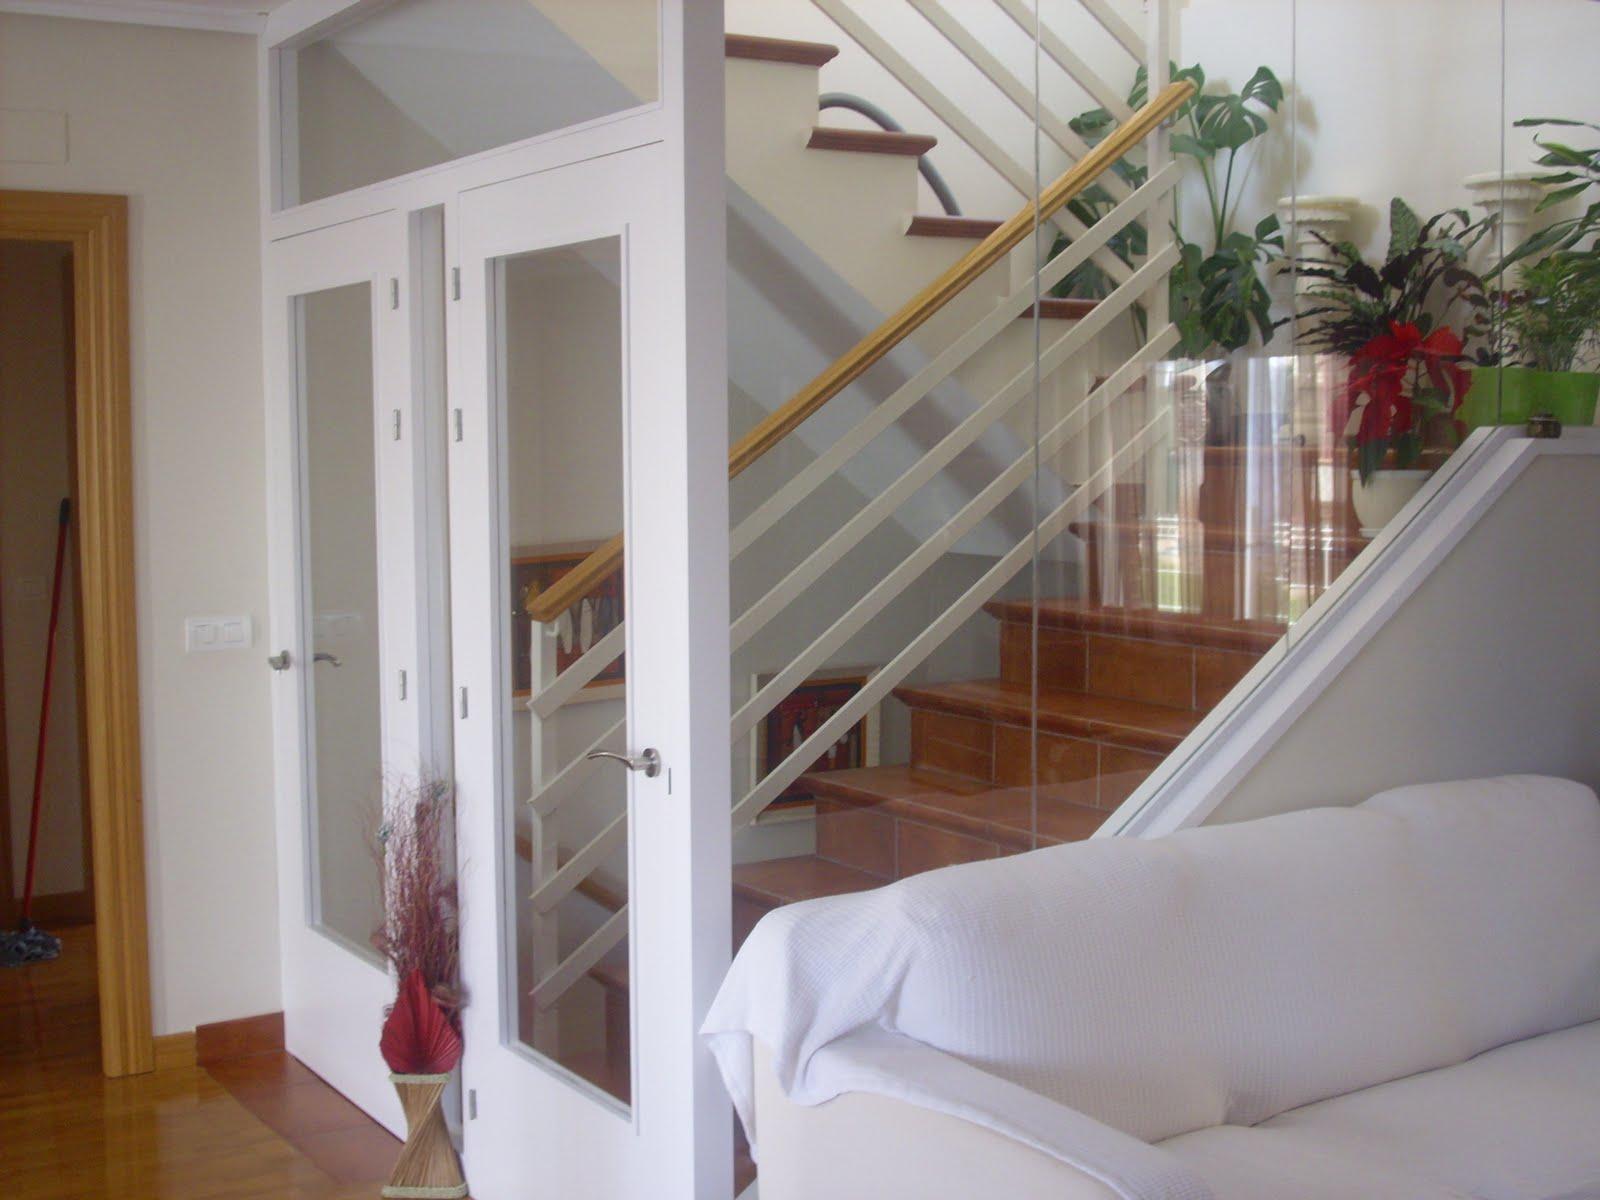 El carpintero cerramiento de huecos de escalera for Huecos de escaleras modernos